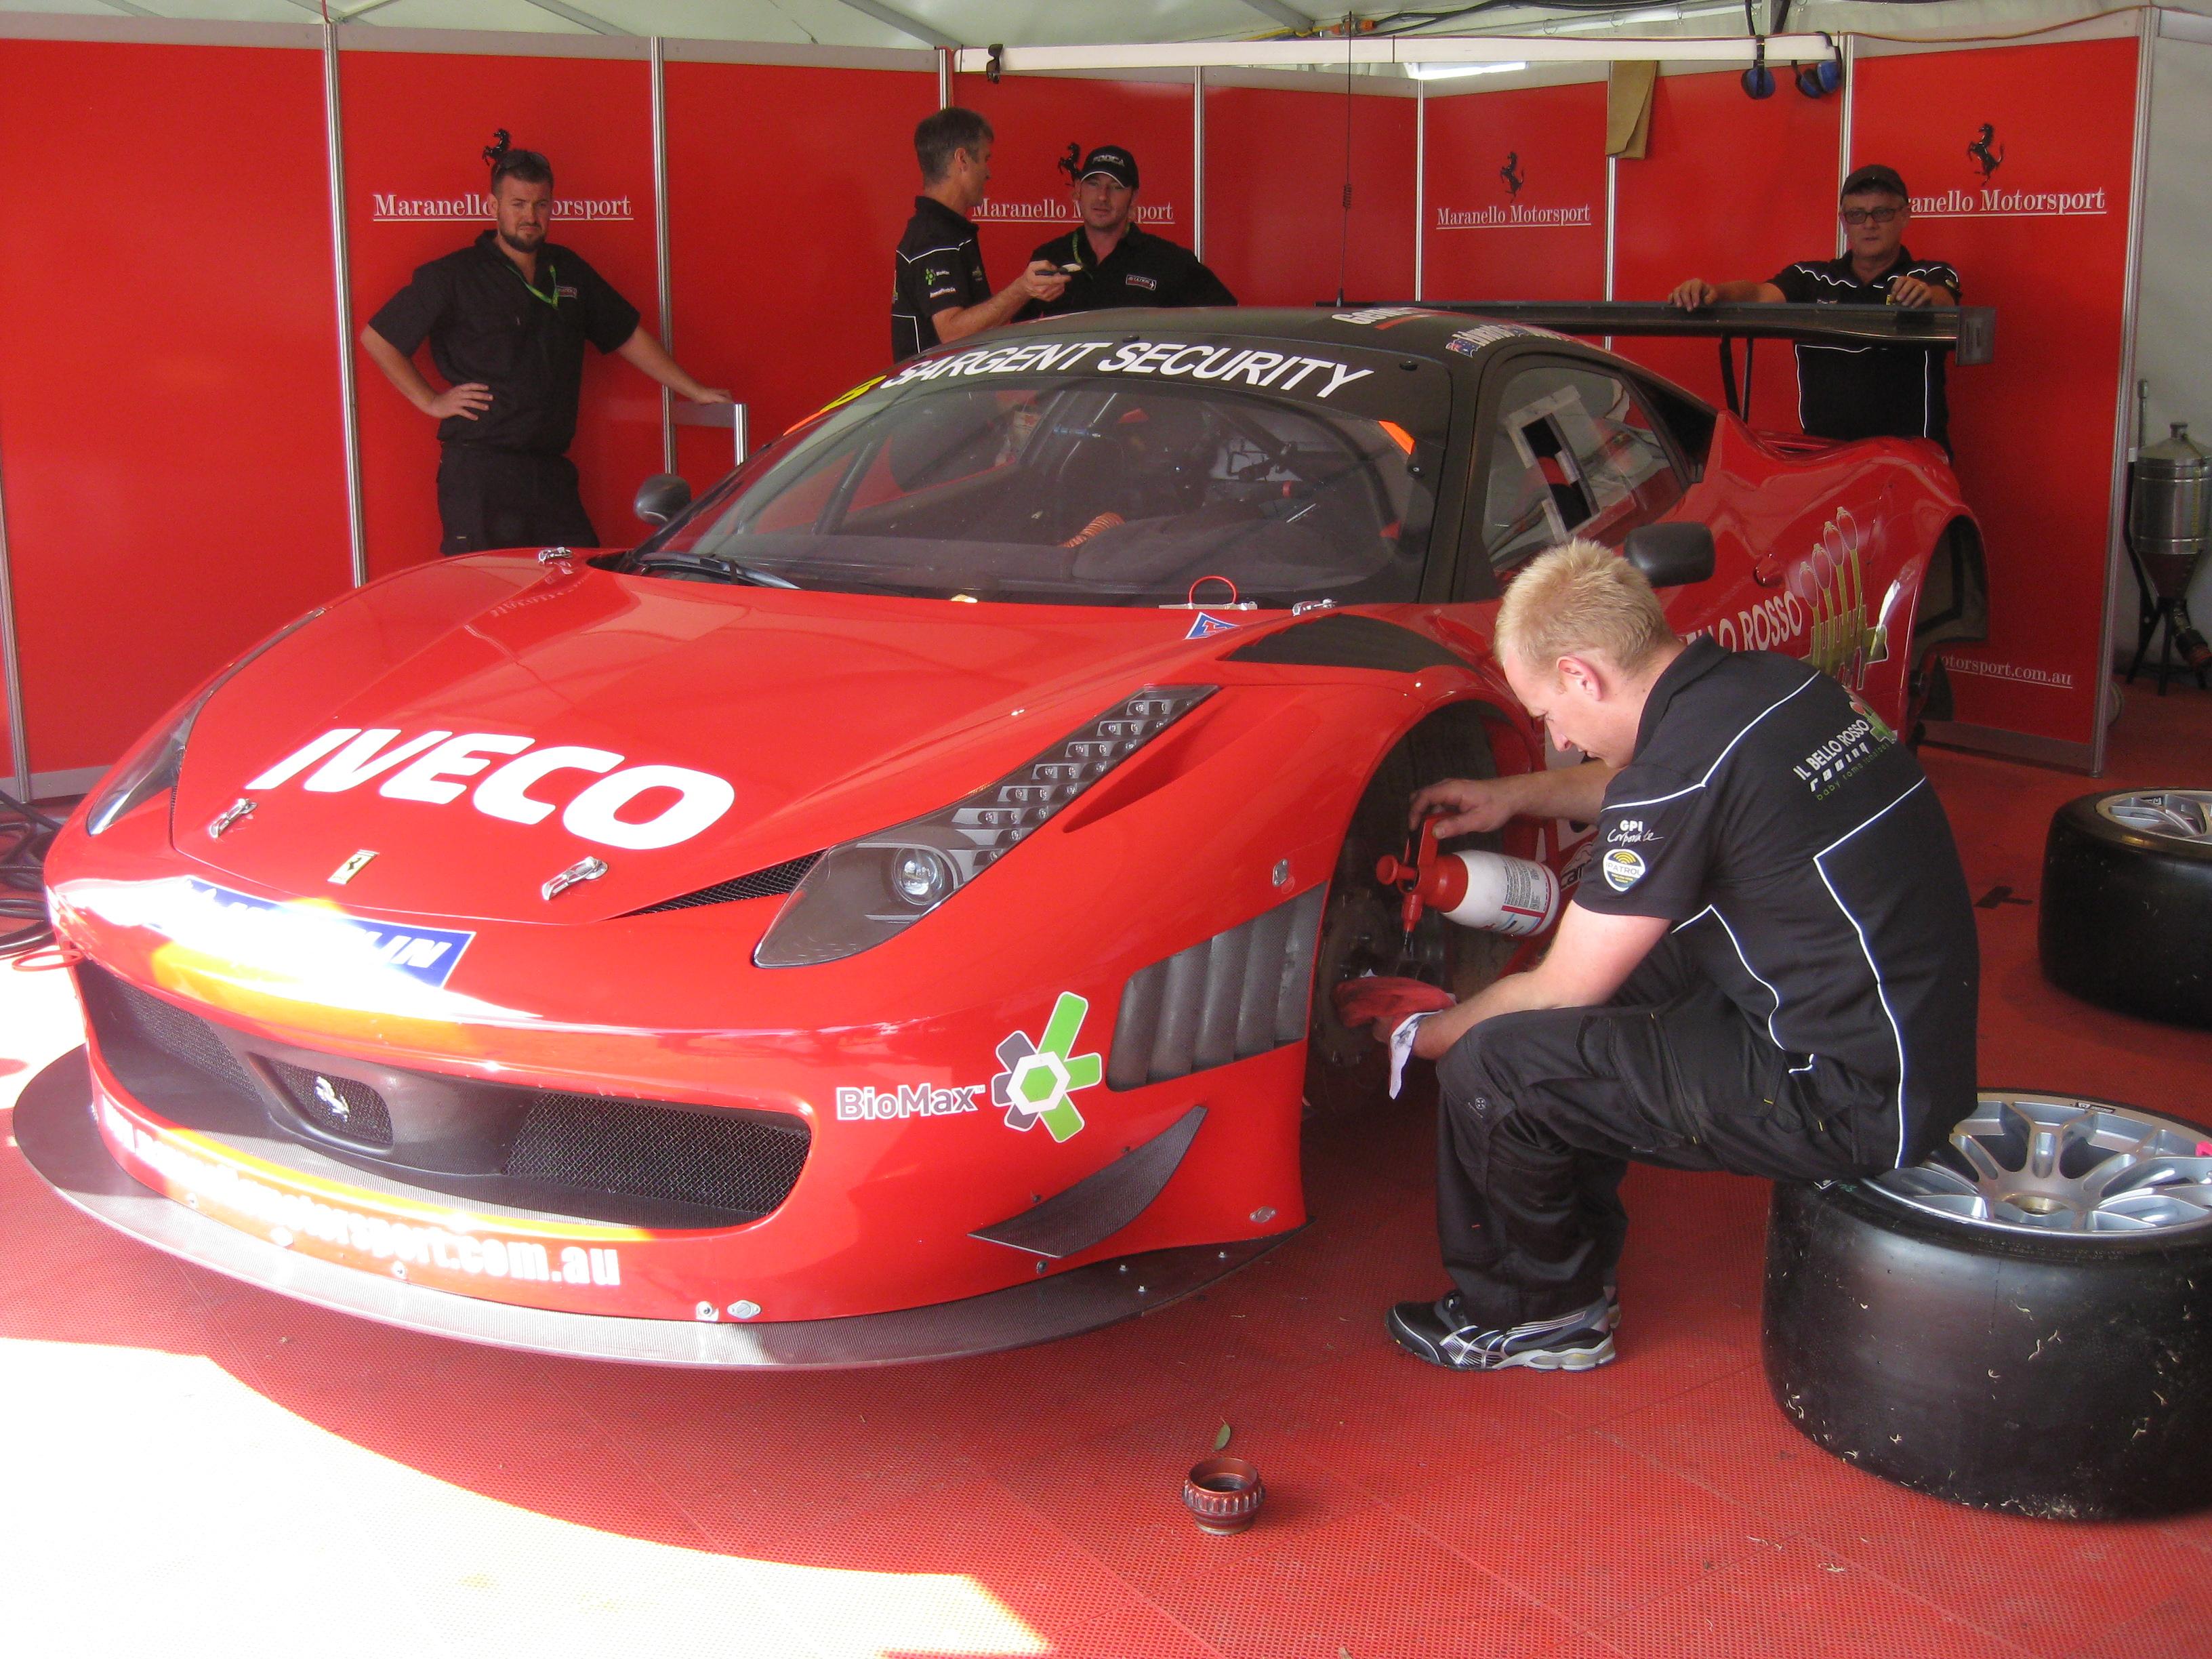 File Ferrari 458 Italia Gt3 Of Maranello Motorsport Jpg Wikimedia Commons